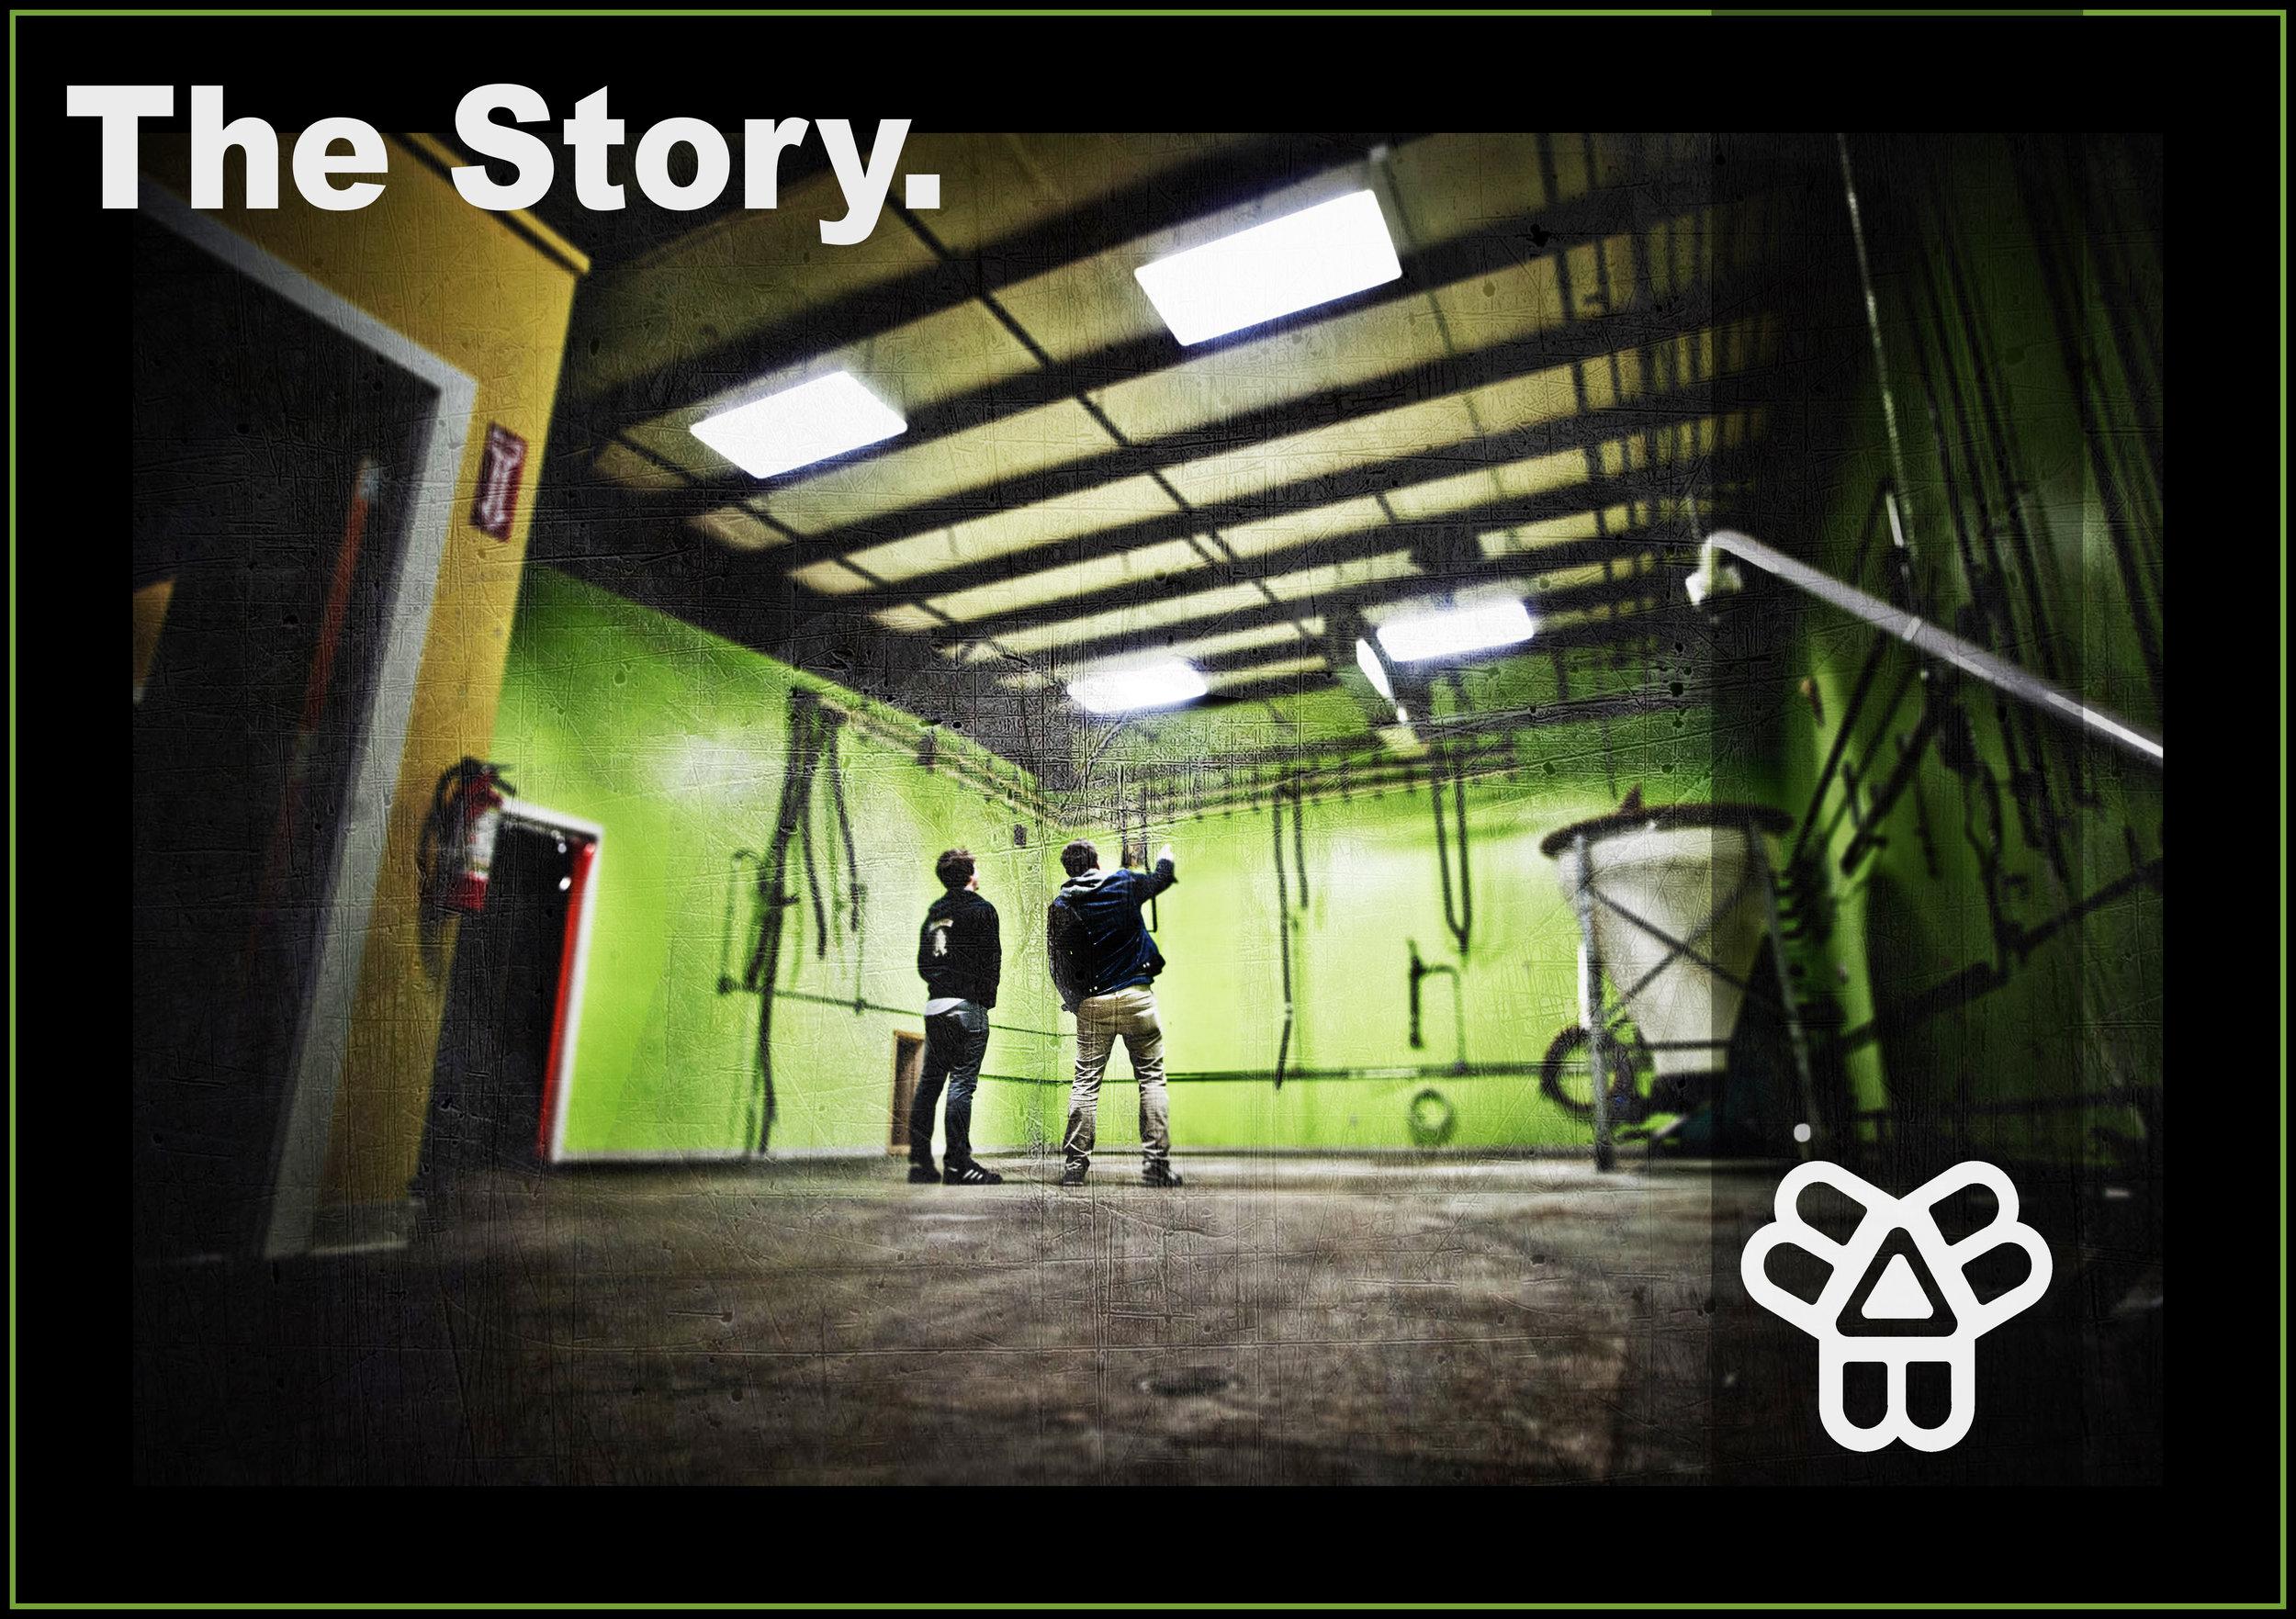 The Story.jpg